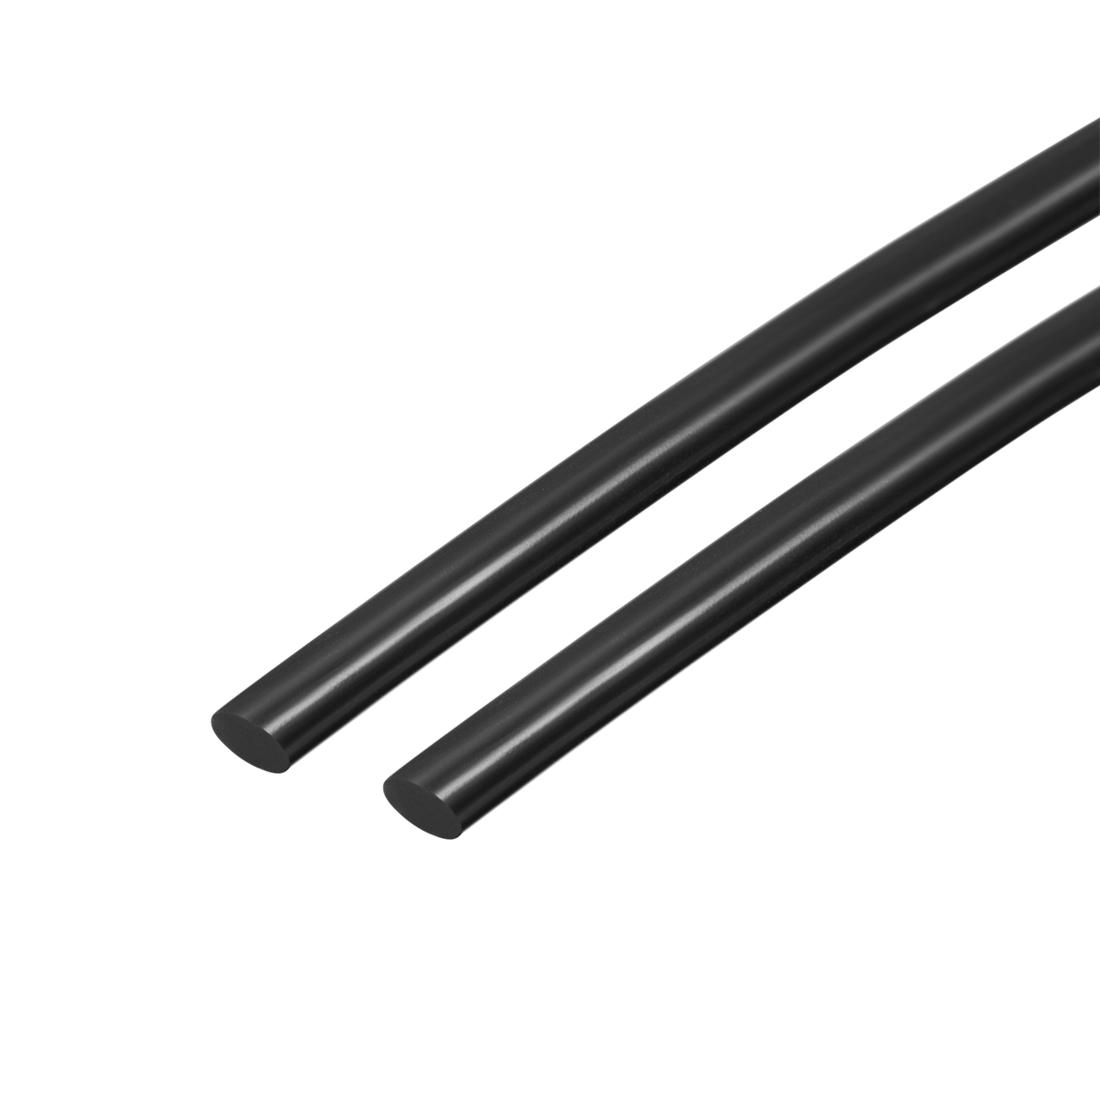 "39"" Long 4MM Dia High Temperature Resistant Silicone Sealing Strip (Black, 2pcs)"